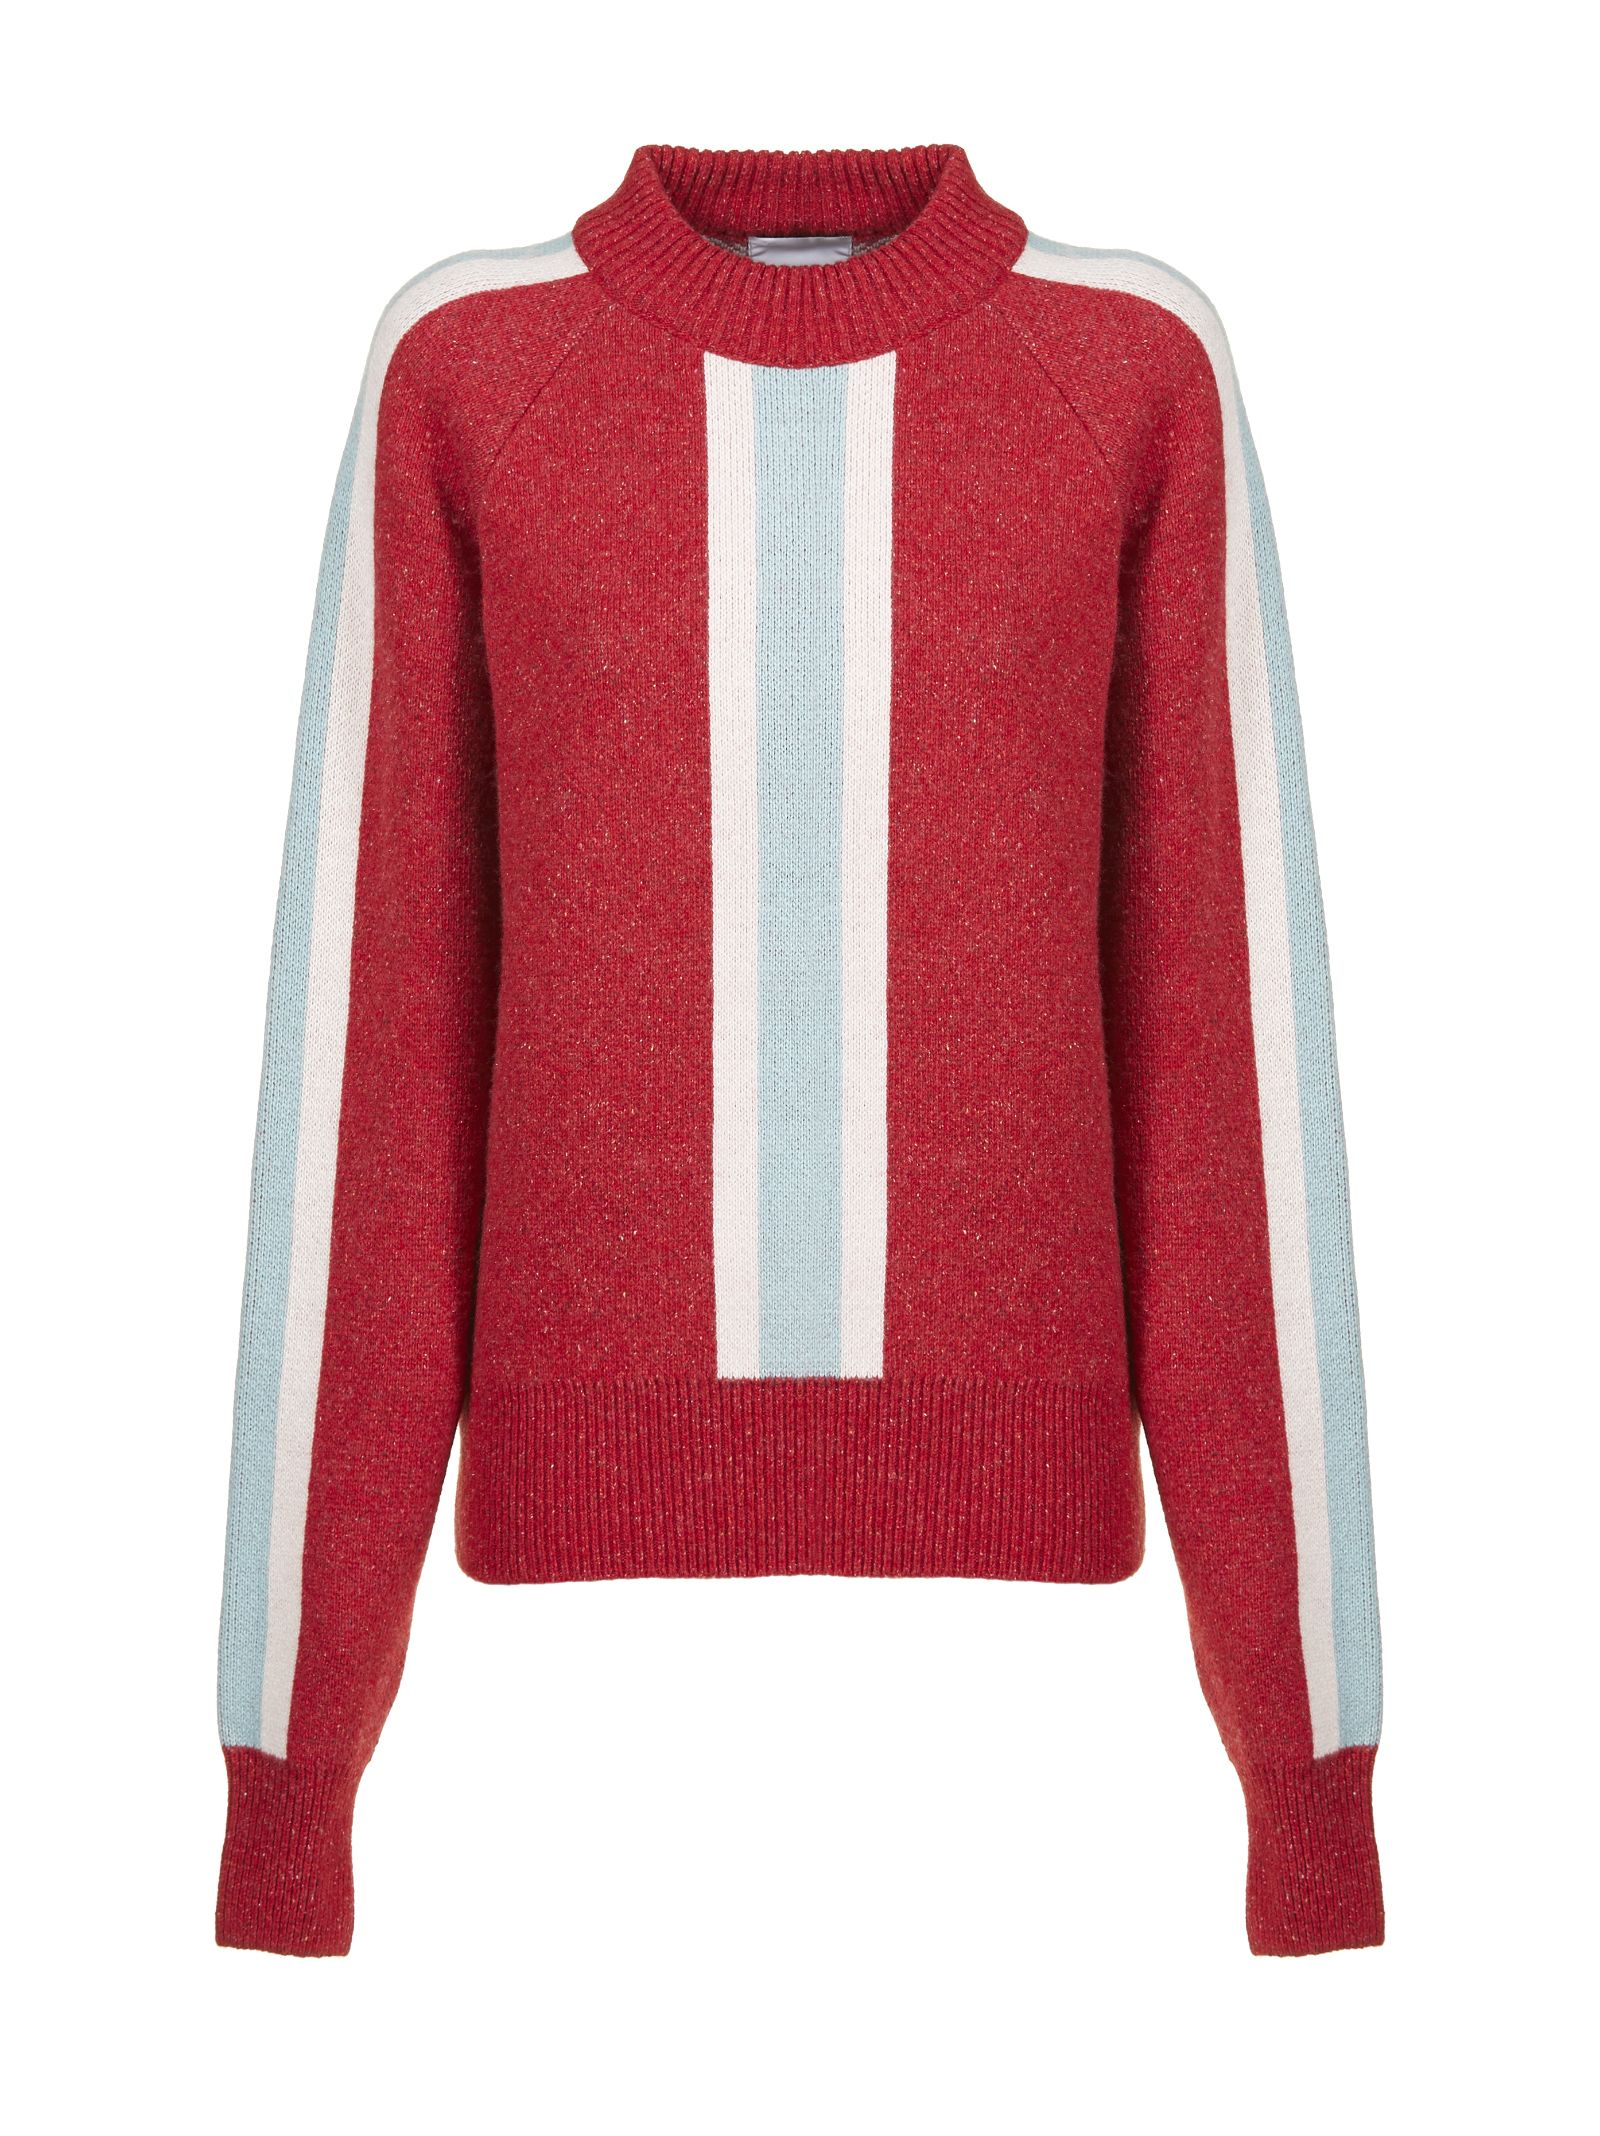 VALENTINE WITMEUR LAB Valentine Witmeur Leaderish Sweater in Rosso Celeste Rosa